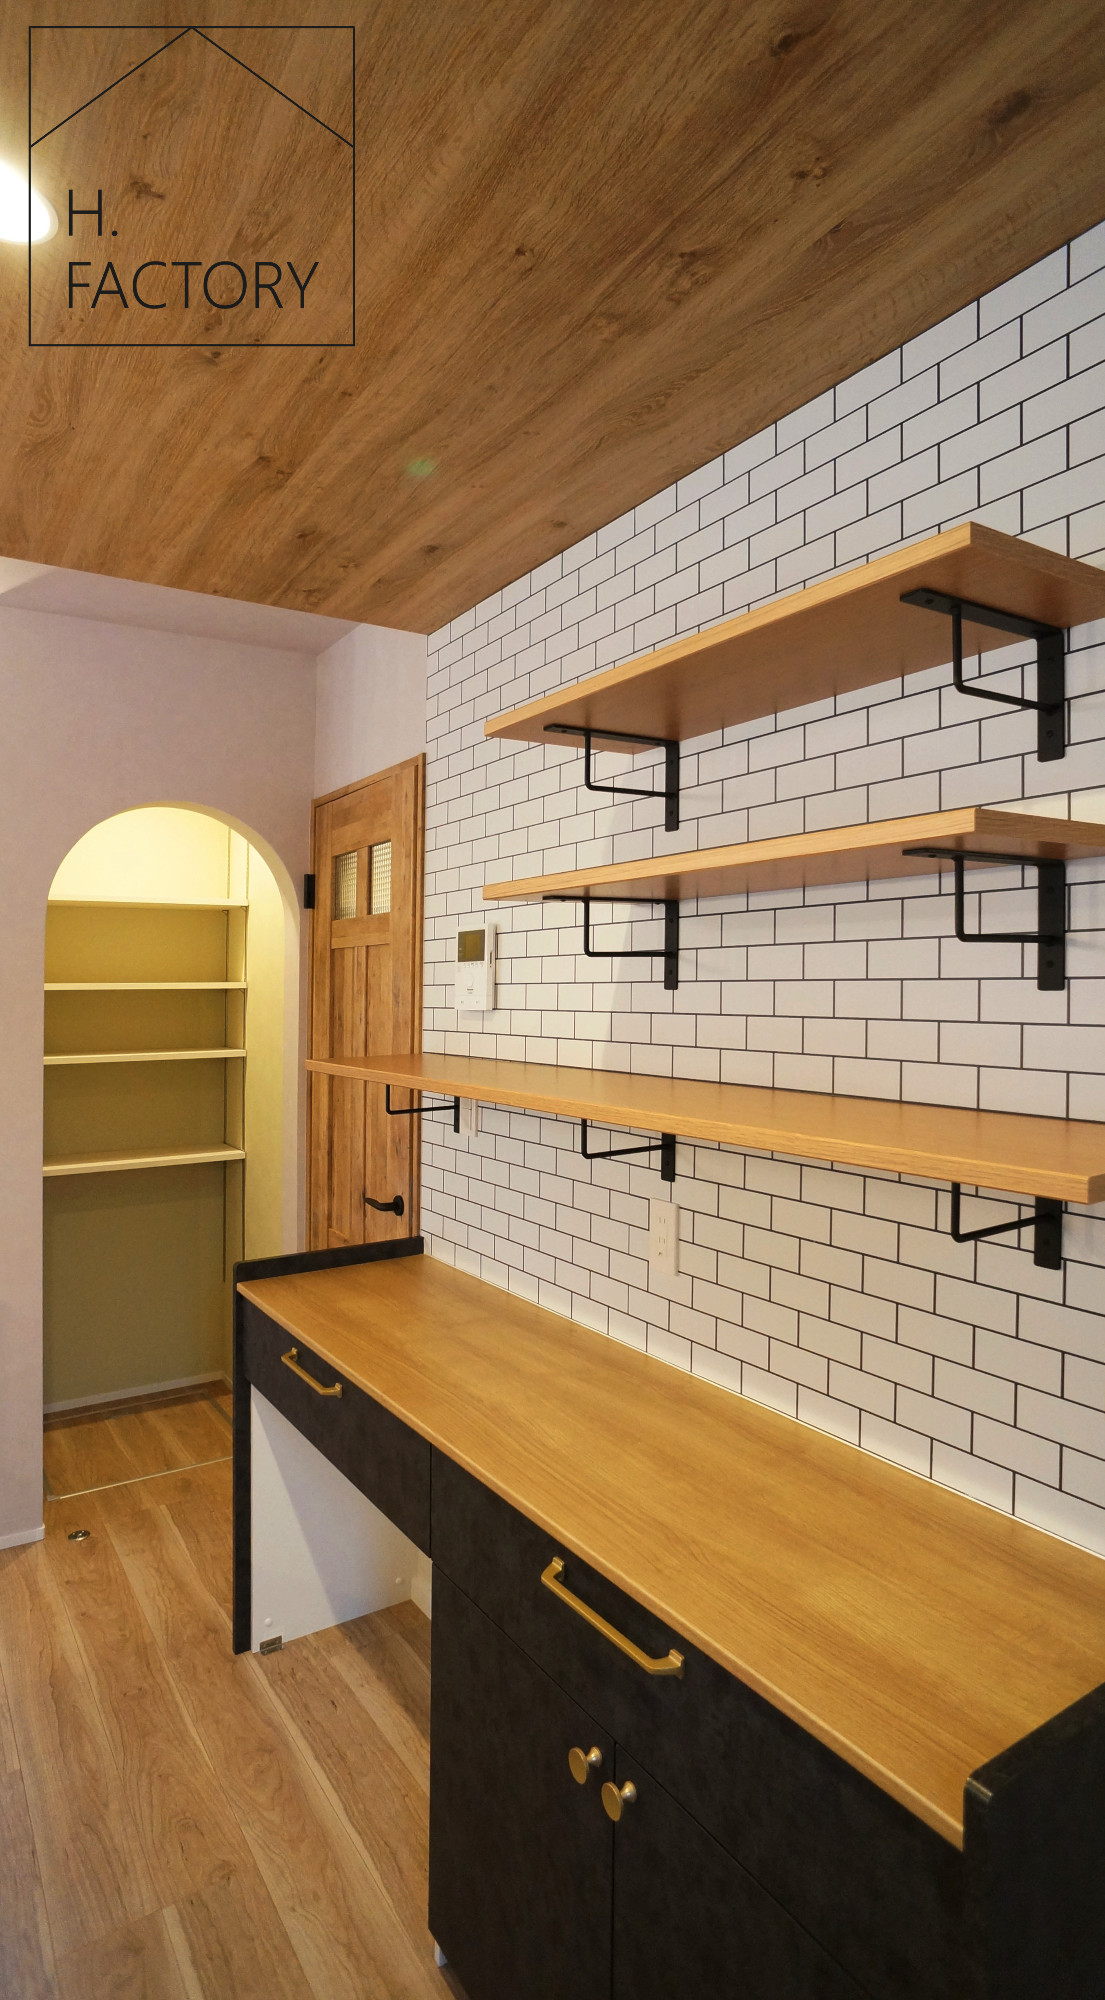 H.FACTORY/株式会社 橋本技建「森の中のカフェ&サロンの家」の実例写真